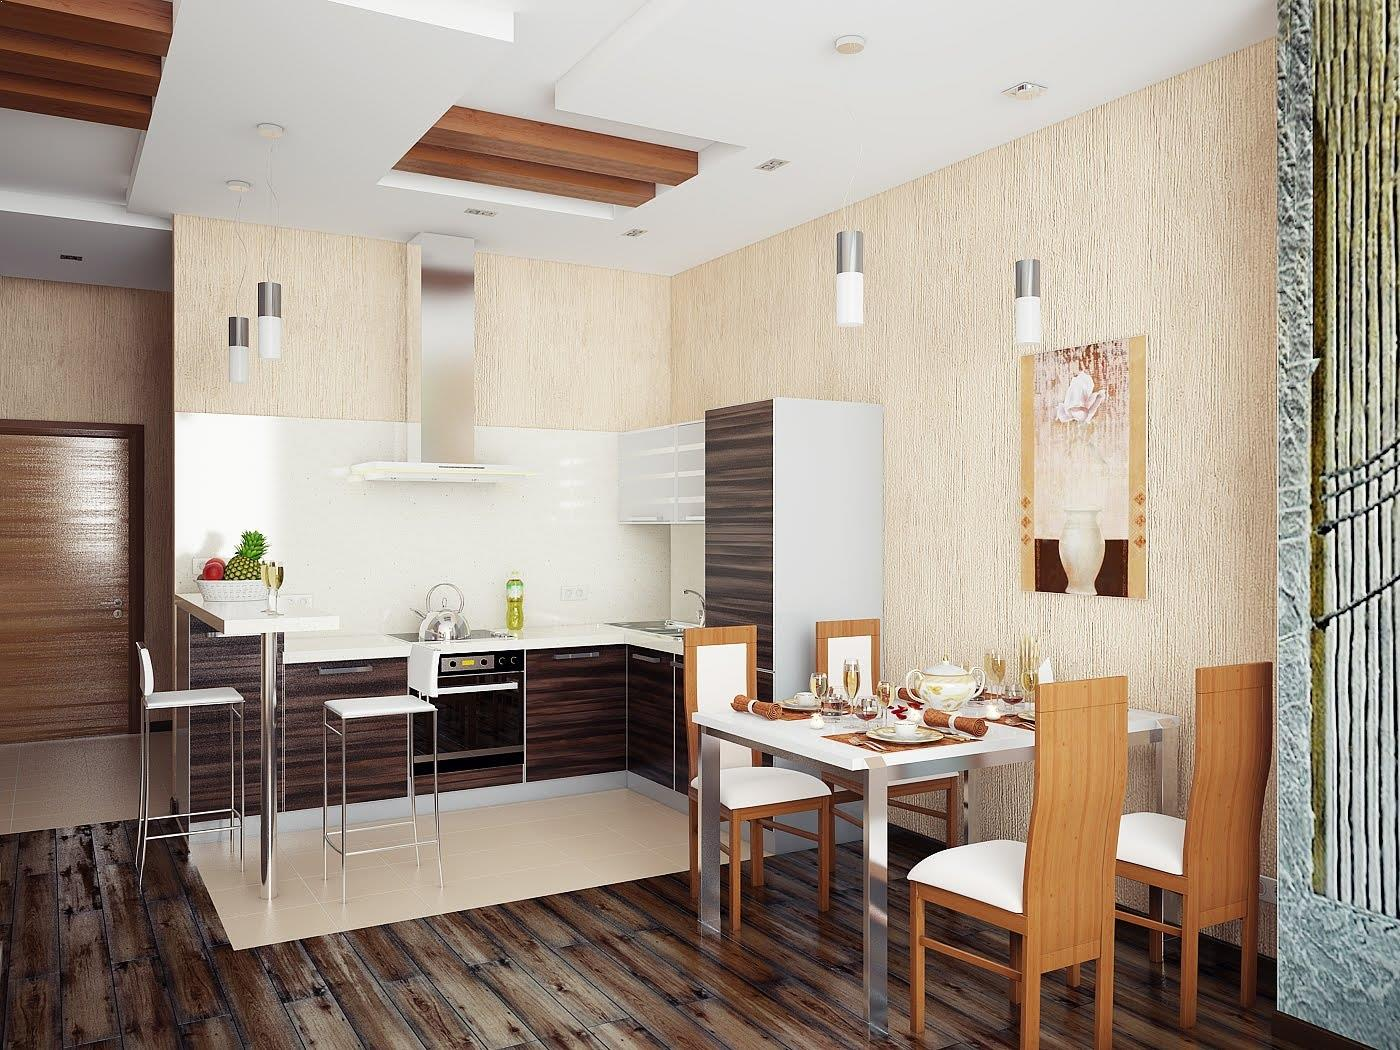 Small Kitchen Tables Dining Room Furniture Home Interior Exterior Decor Design Ideas